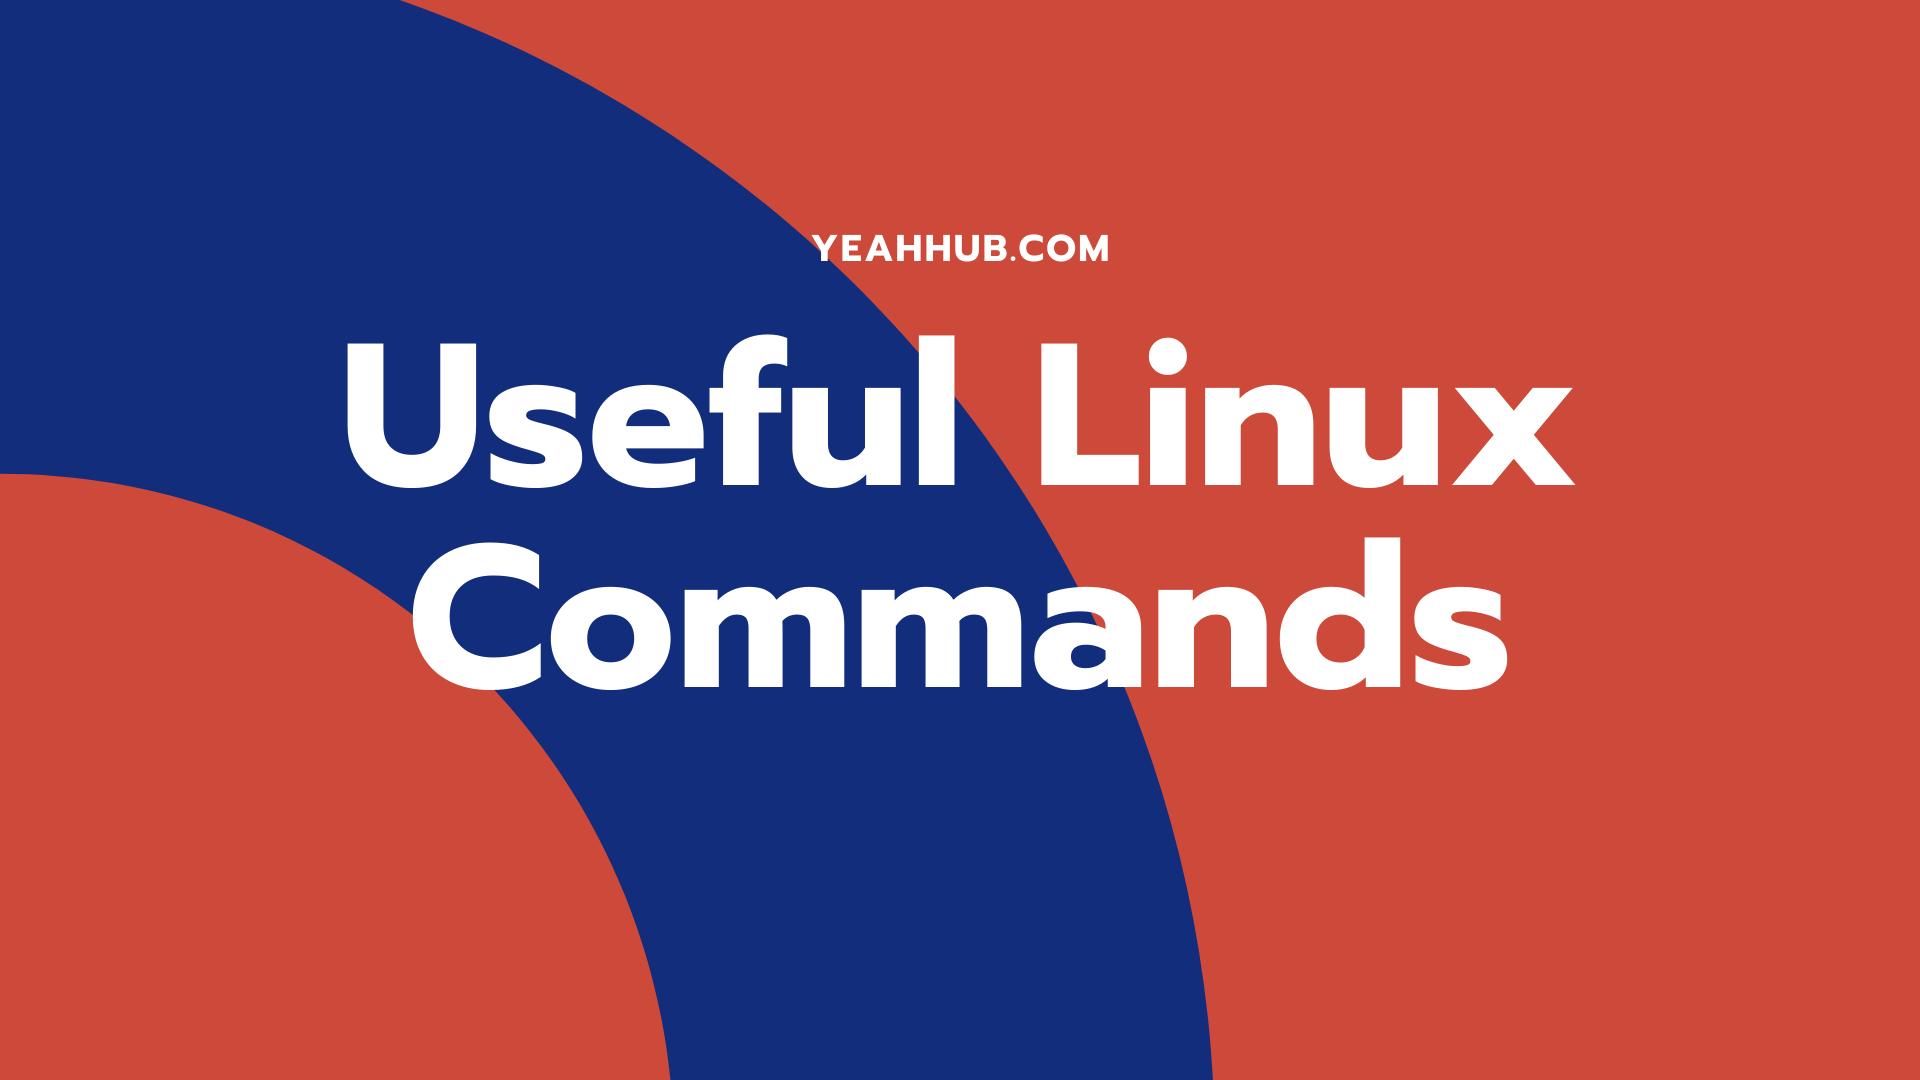 Useful Linux Commands